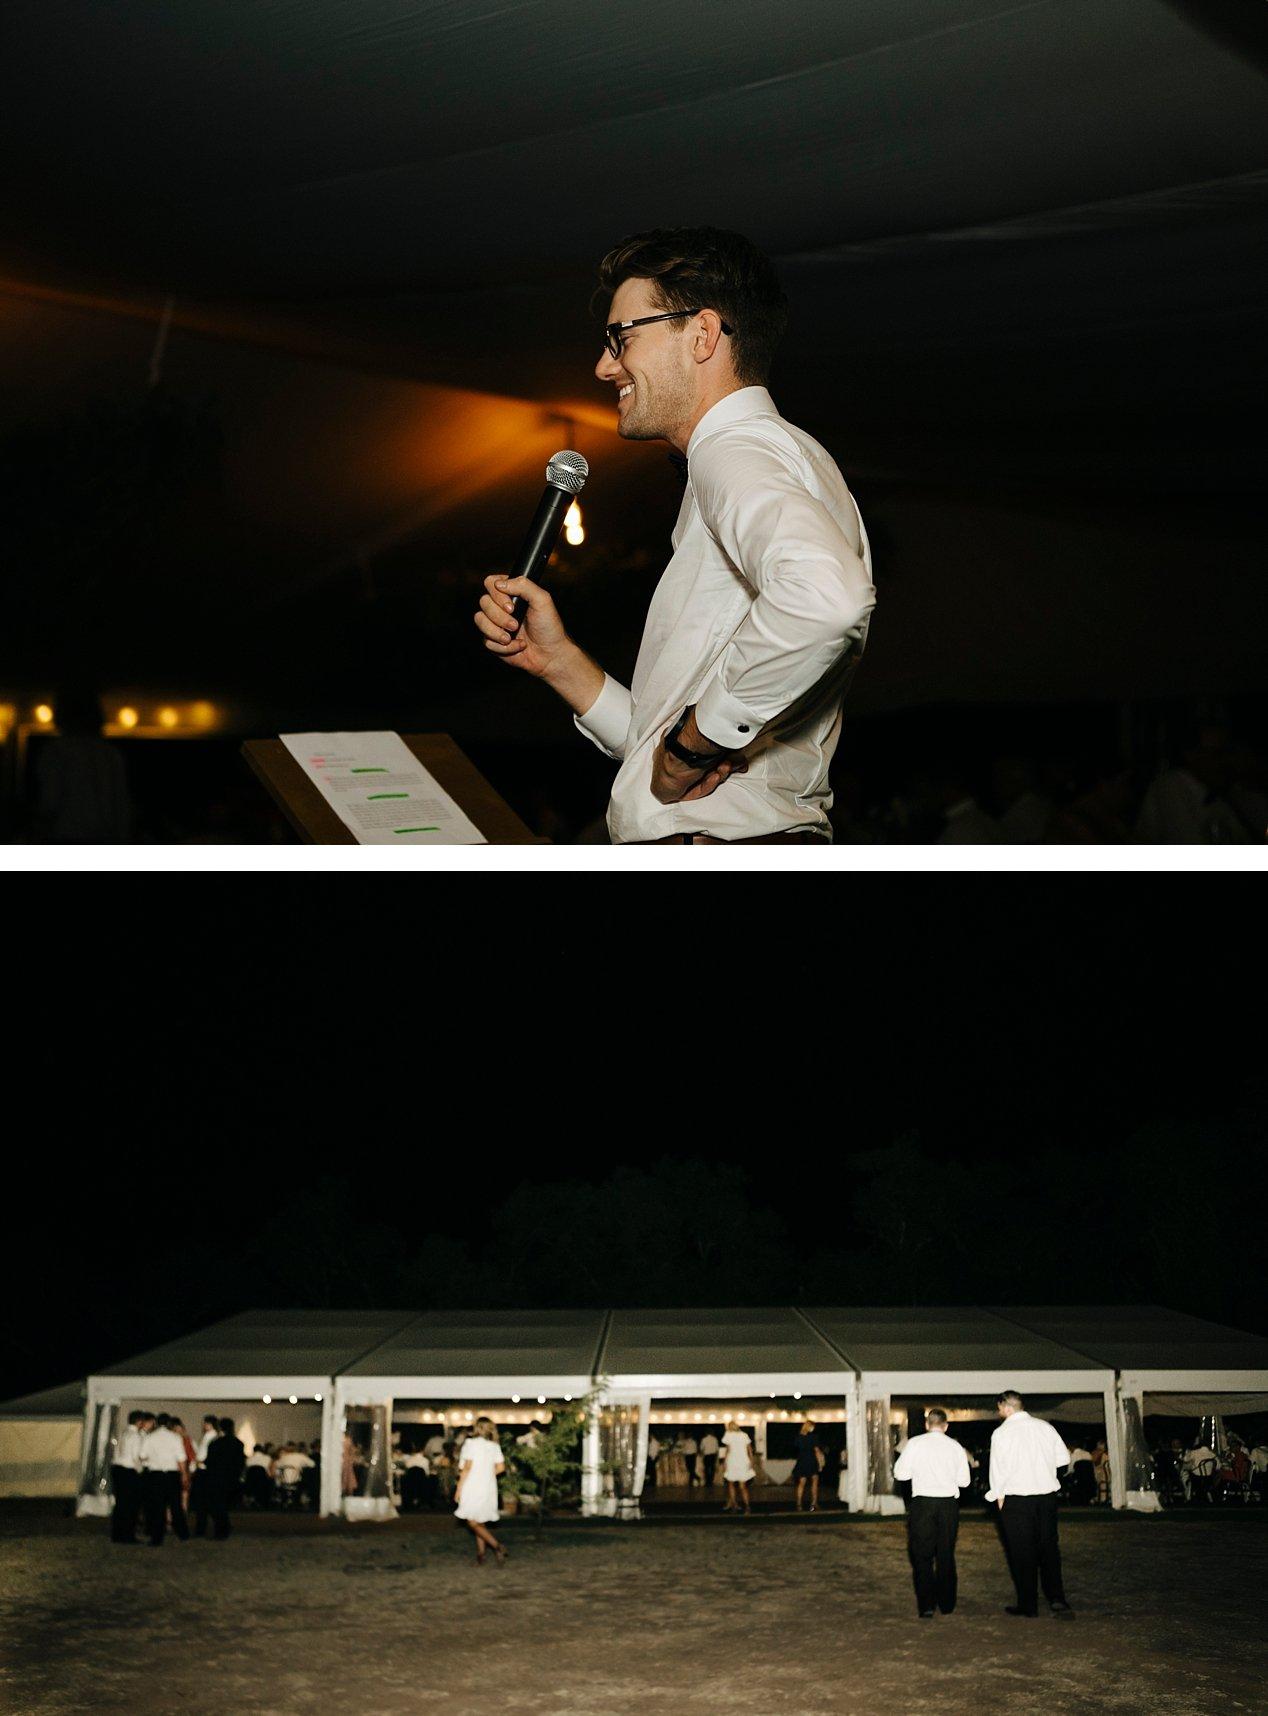 Jerilderie Wedding by Wagga Wagga Wedding Photographer Peppermint Studios_Deniliquin weddings_0105